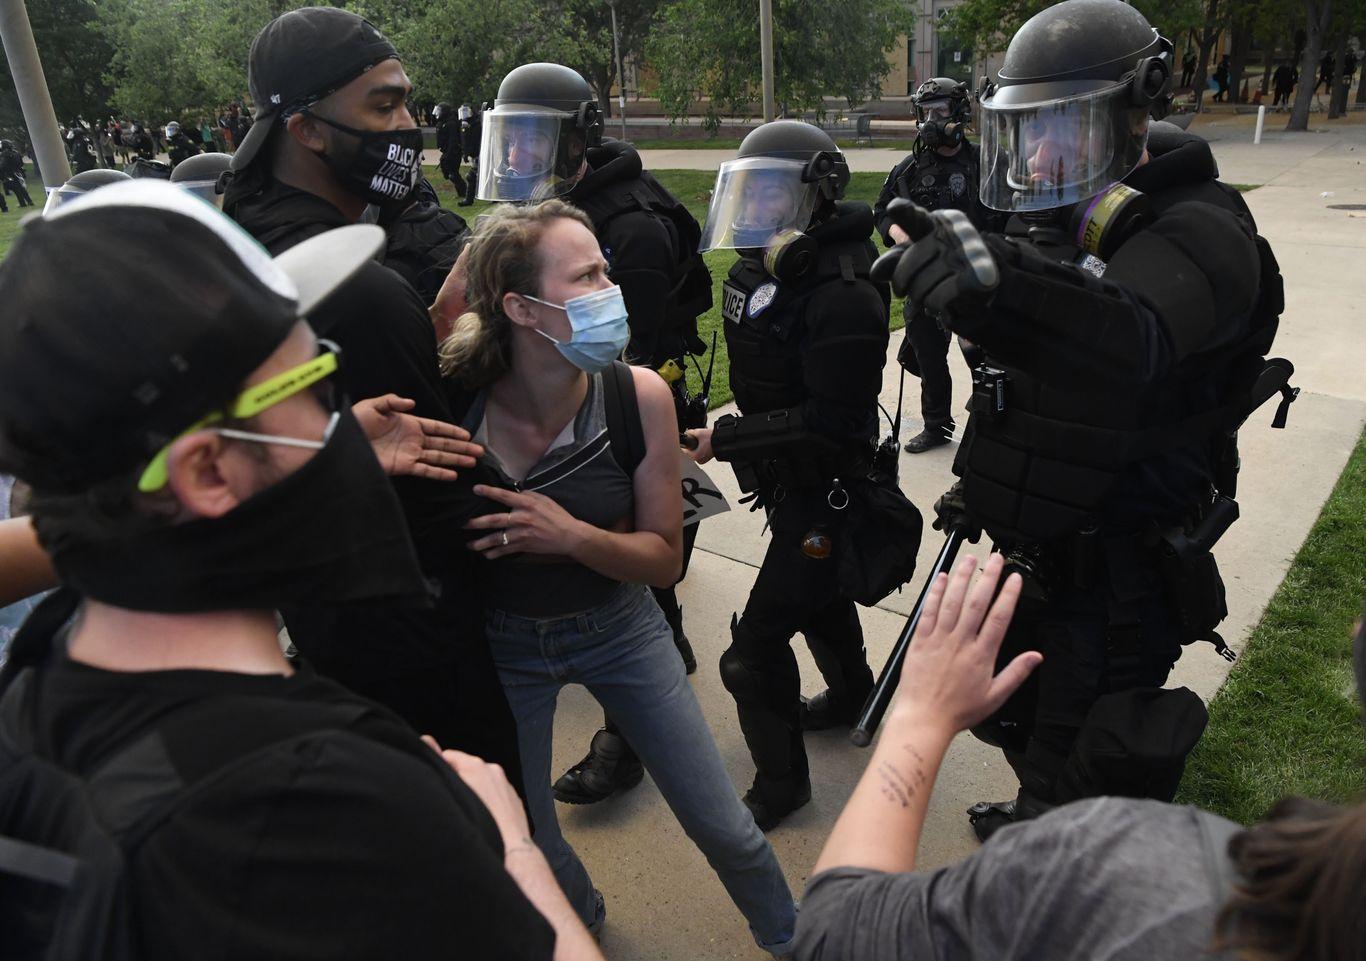 Big enterprise plunges into police reform thumbnail